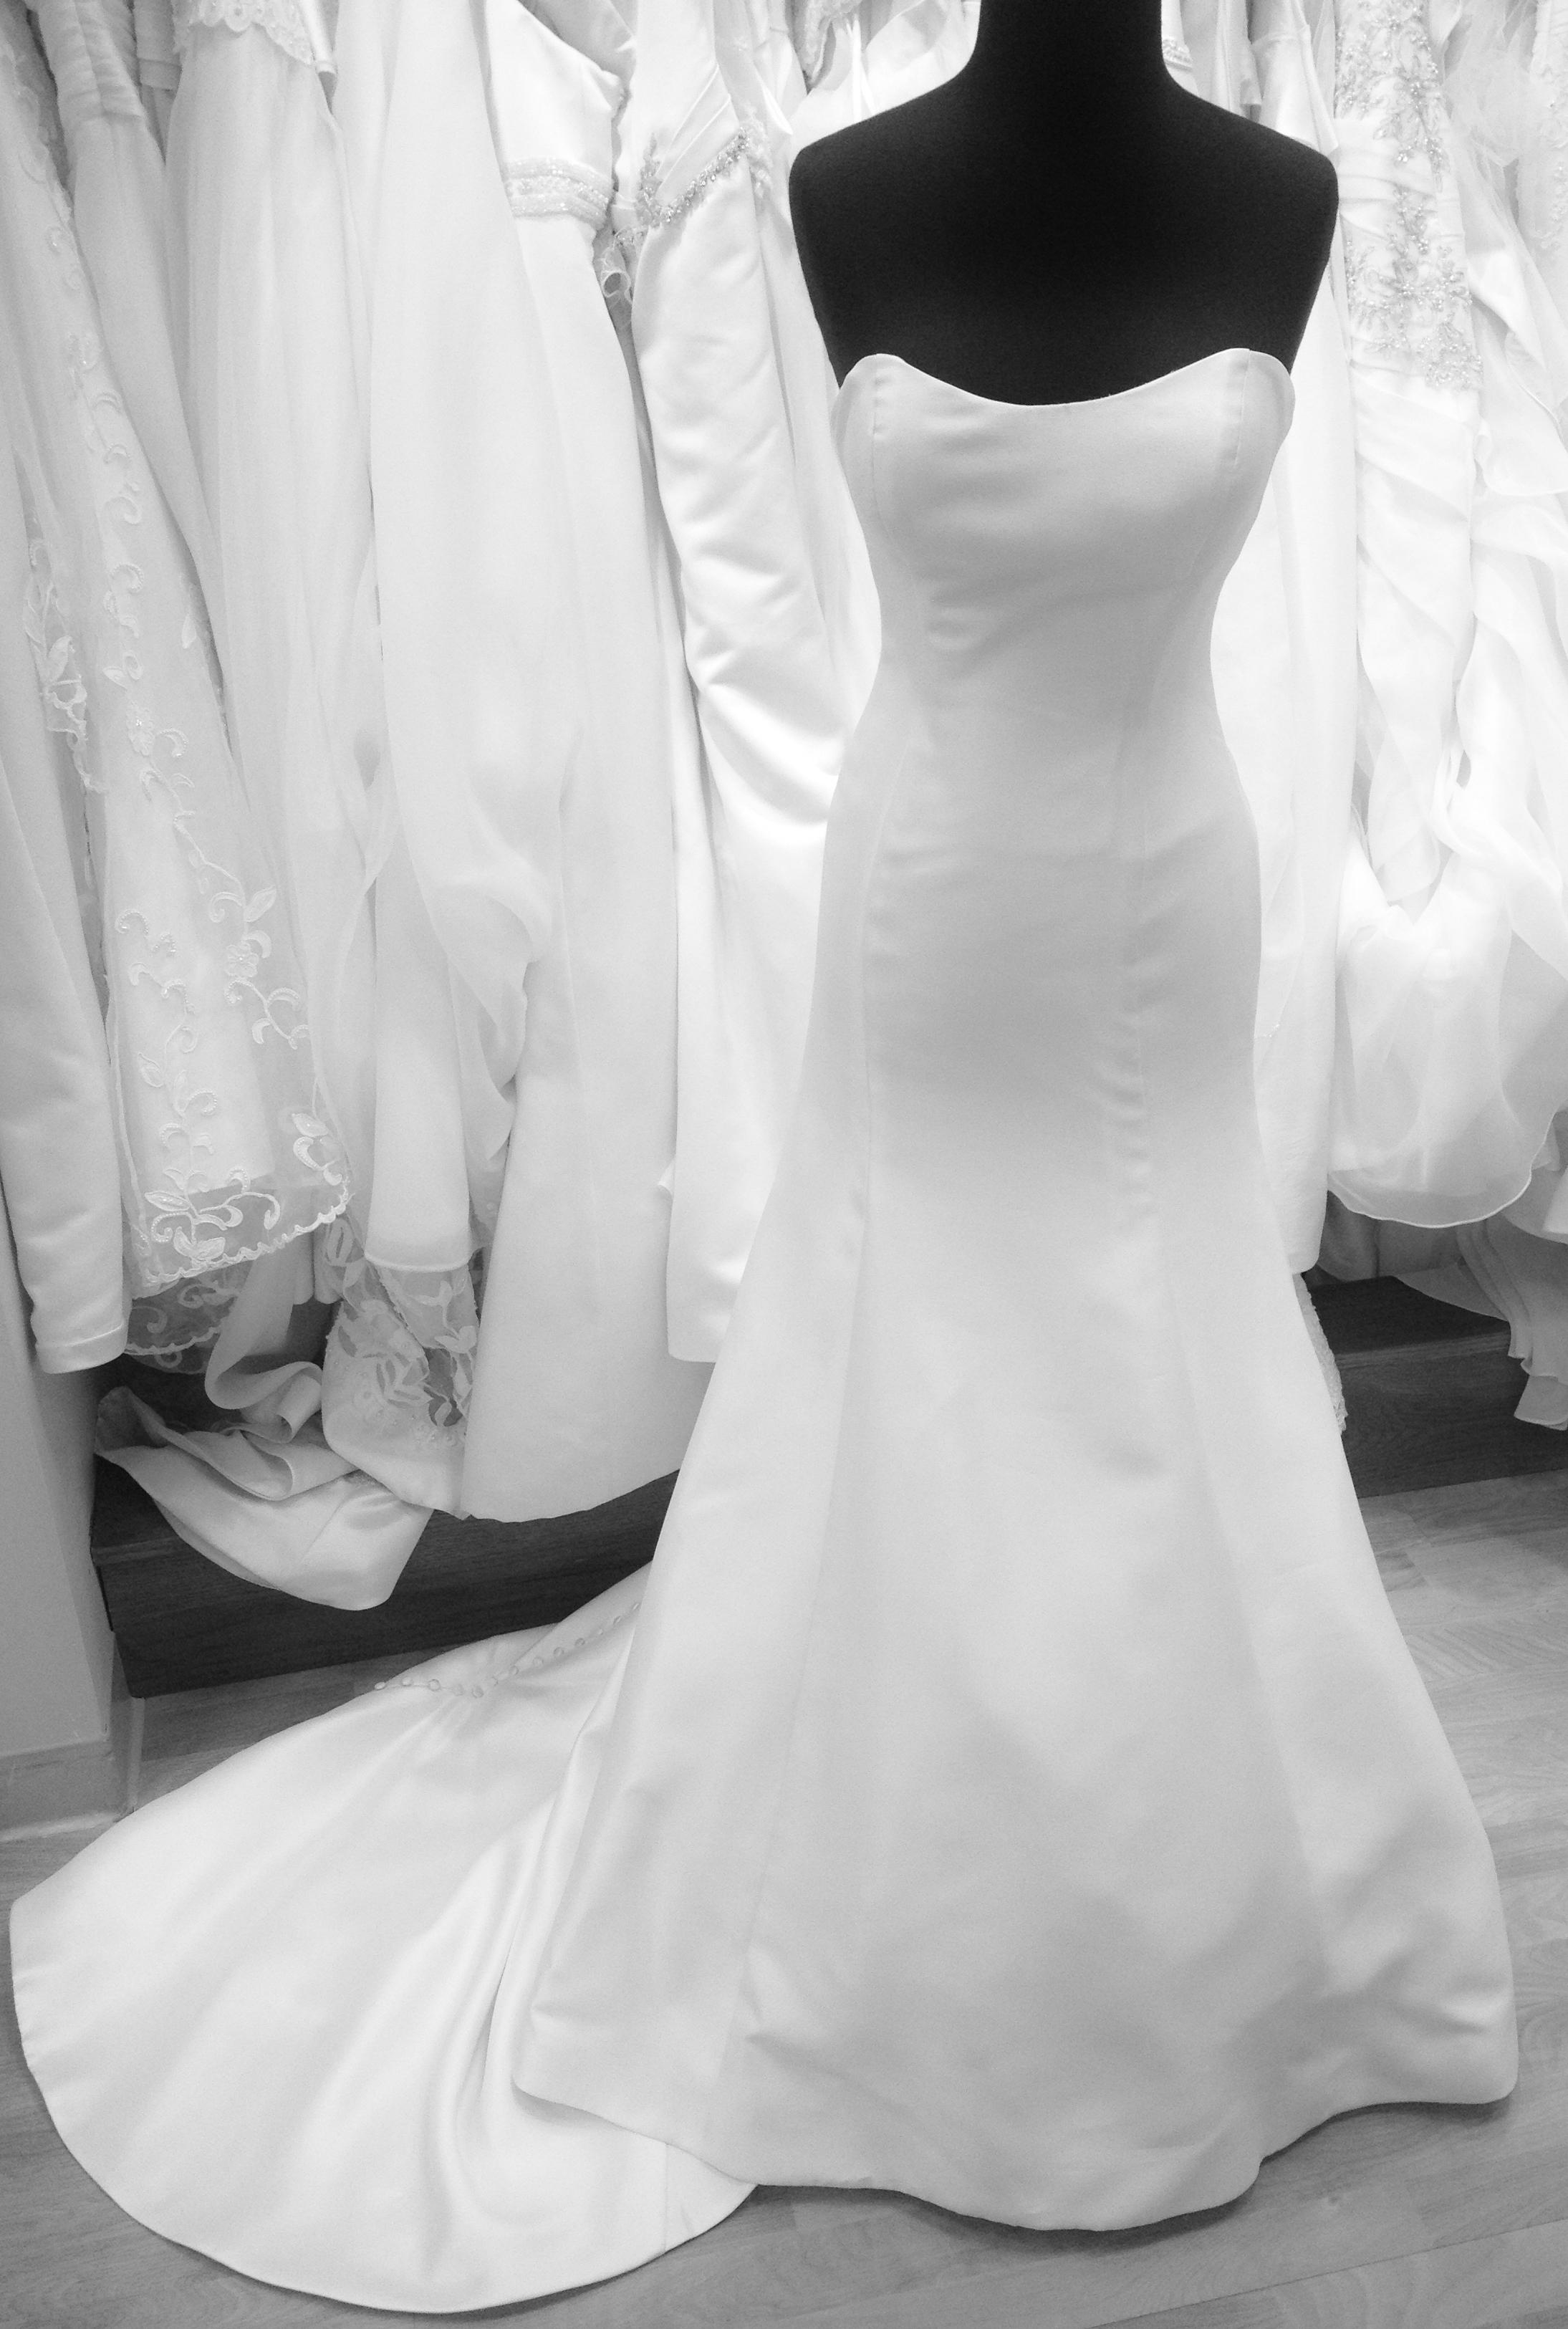 Fabulous Designer Wedding Dress Rental Online Photo With Vintage Dresses Columbus Ohio